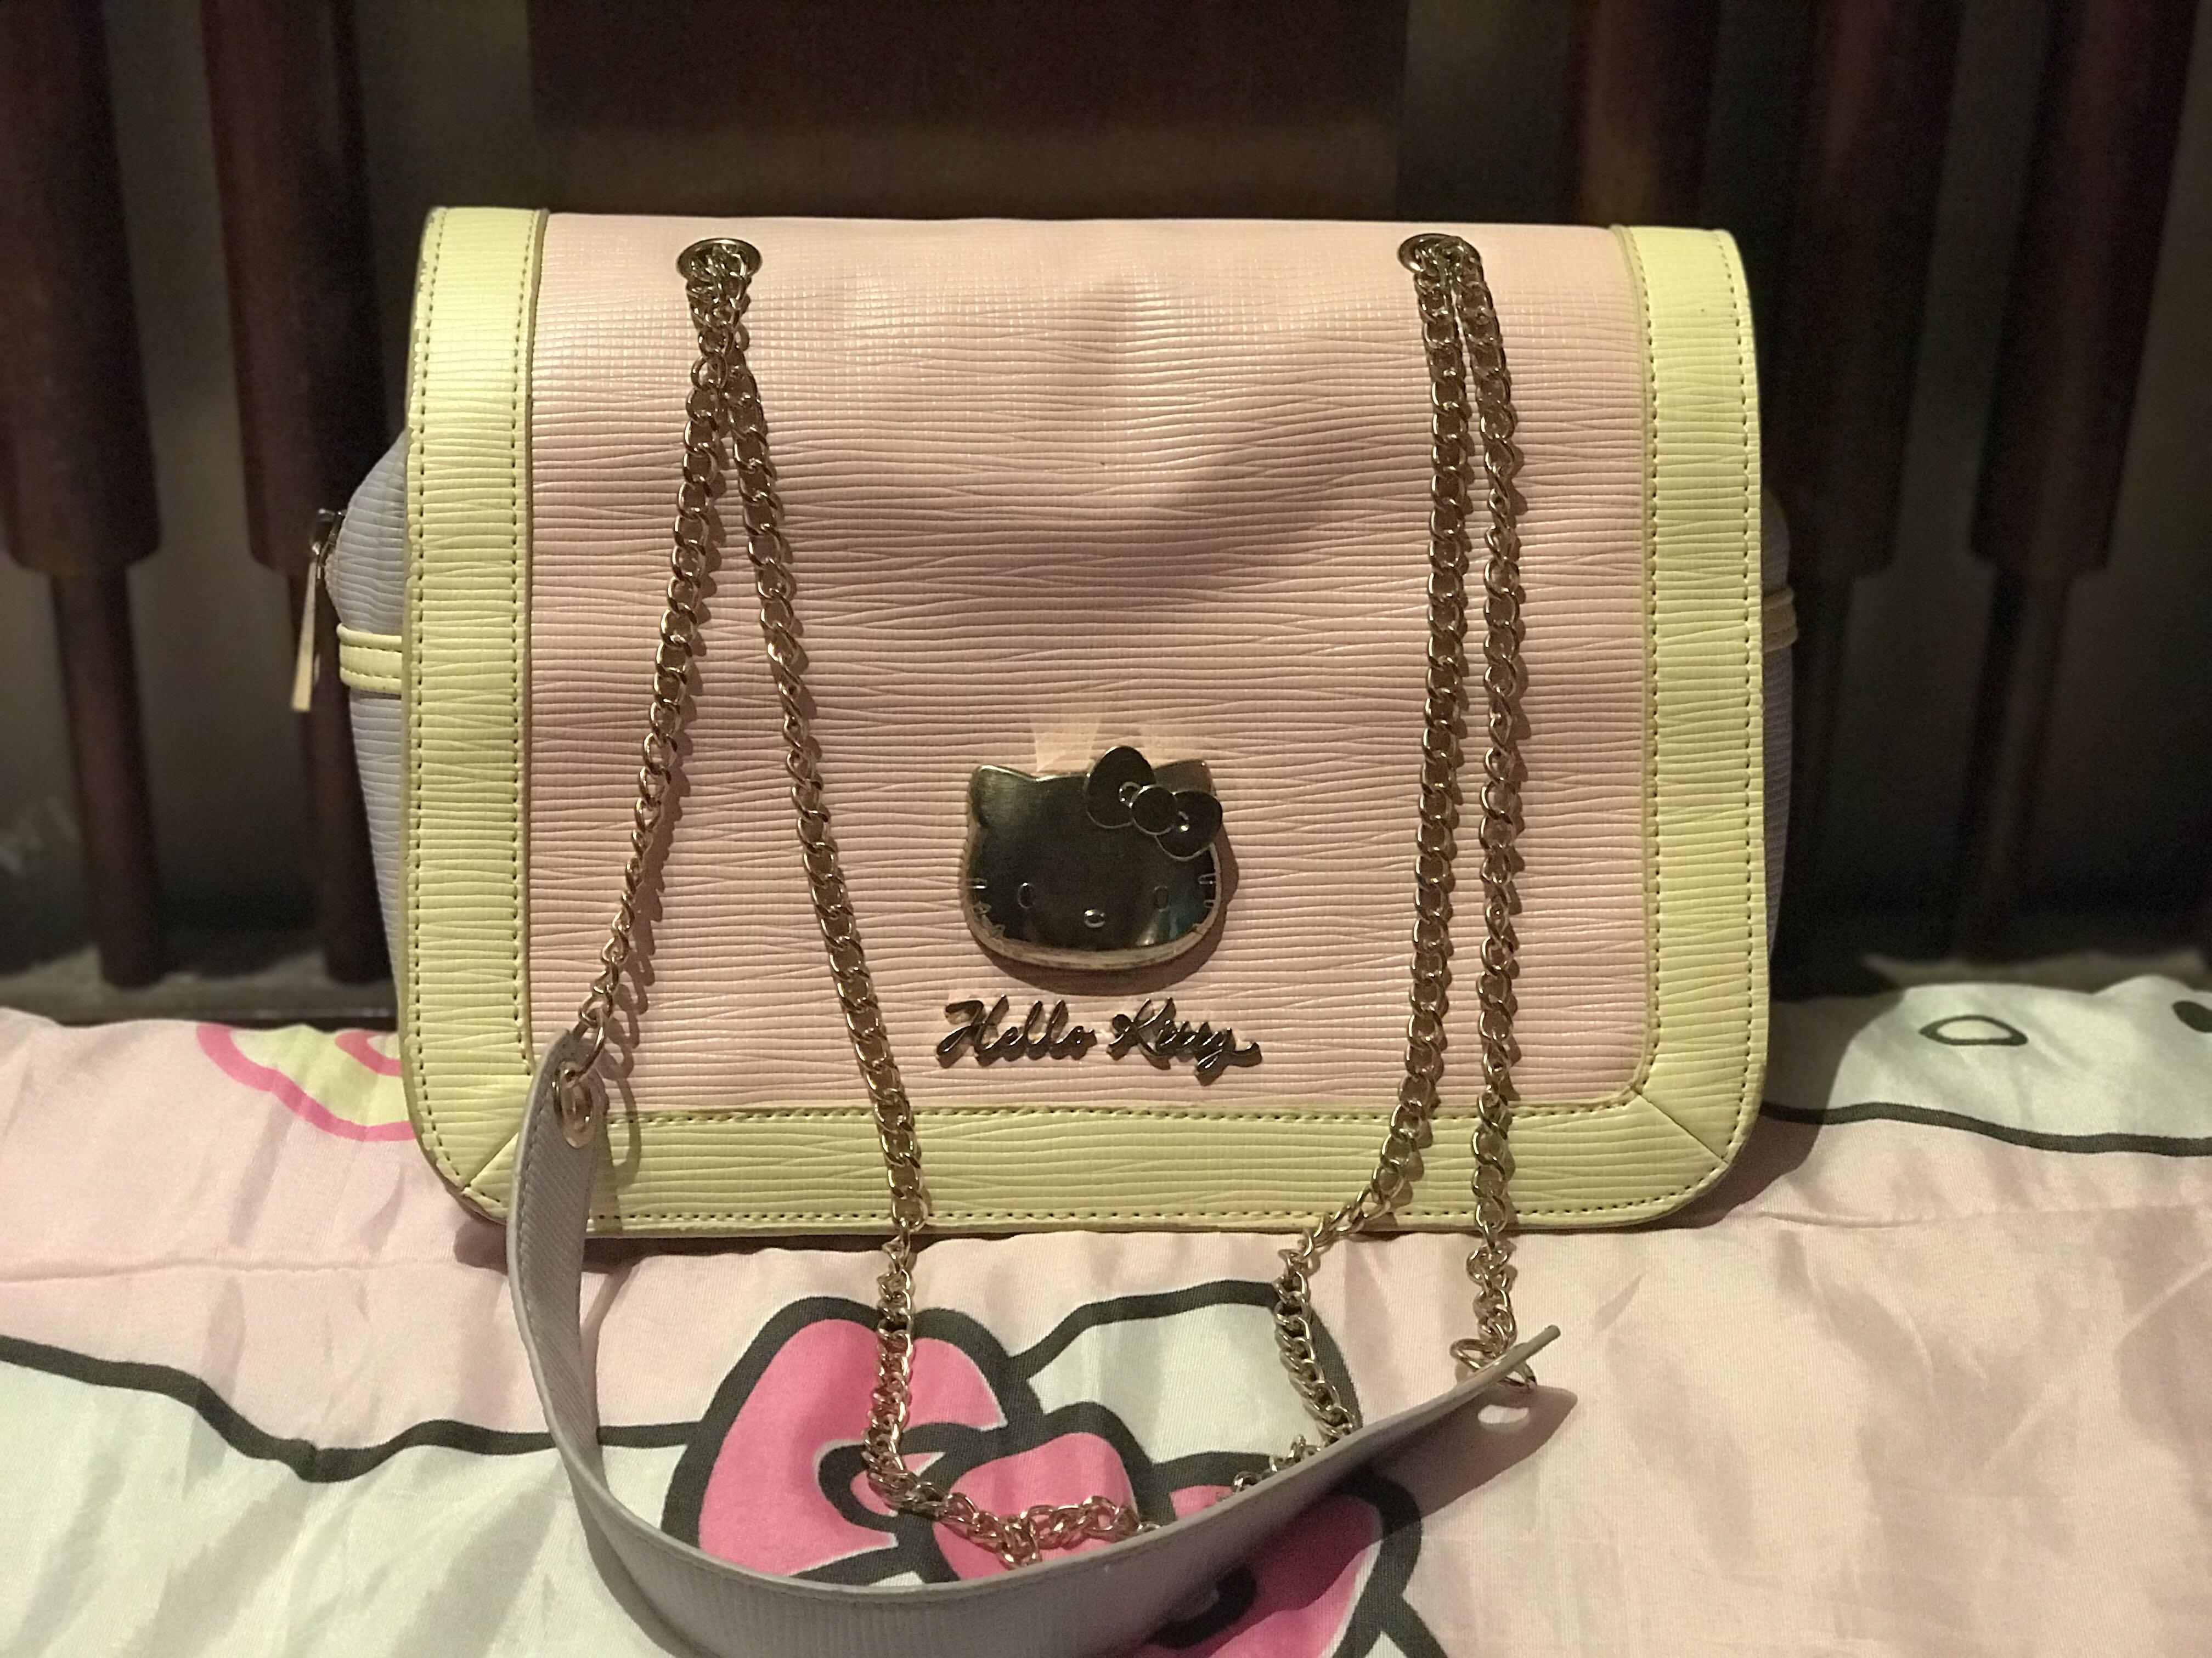 d8a717e30c Home · Women s Fashion · Bags   Wallets. photo photo photo photo